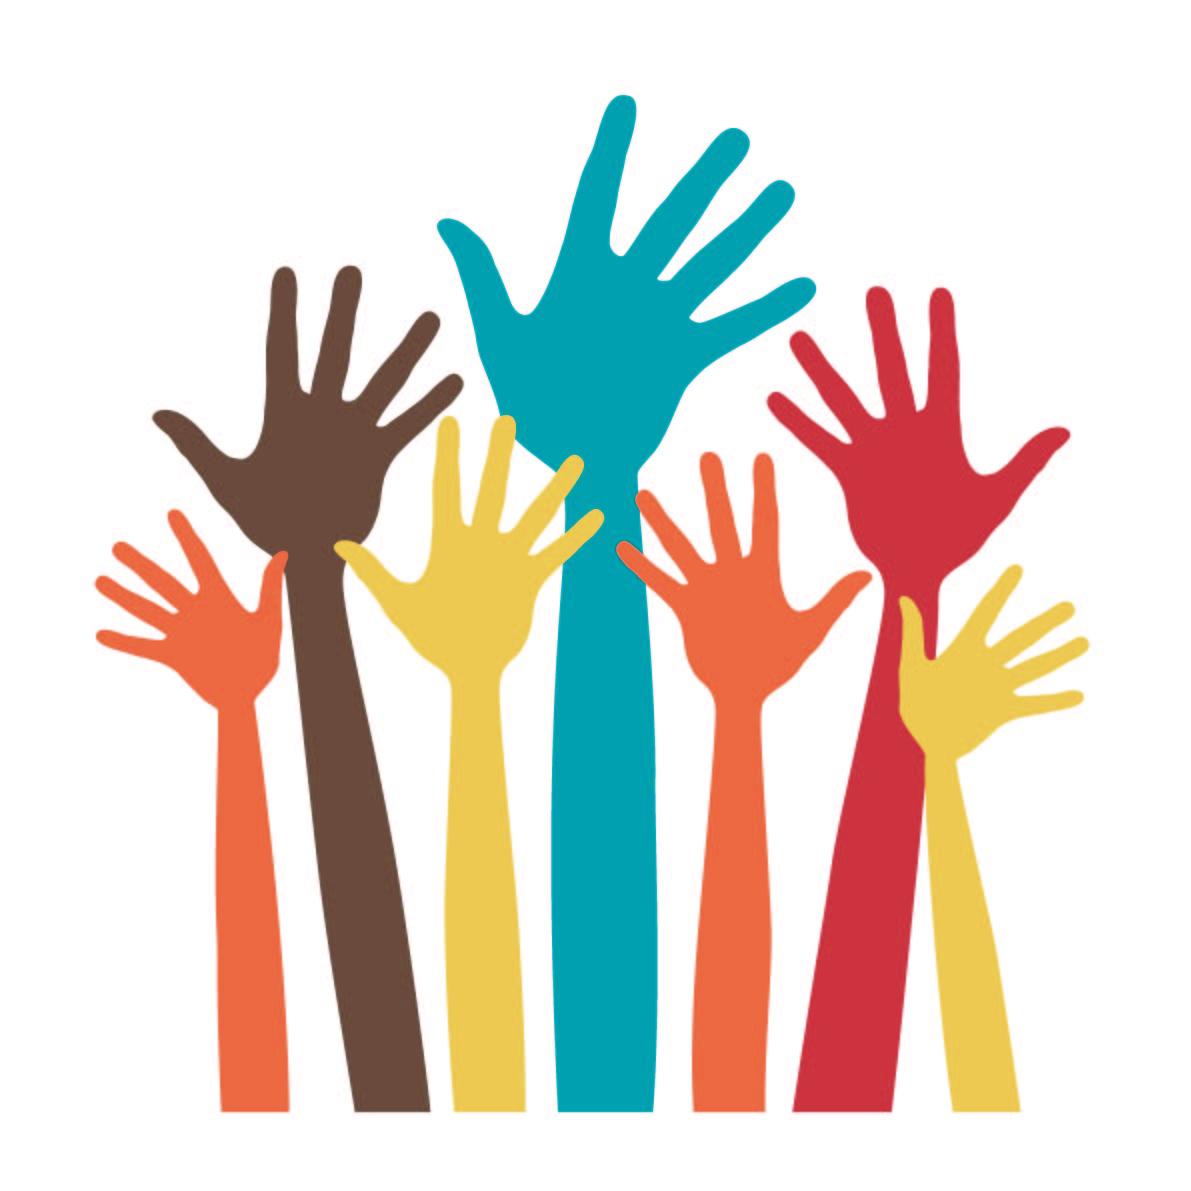 Hand Gesture clipart need you You! Need Volunteer!  We